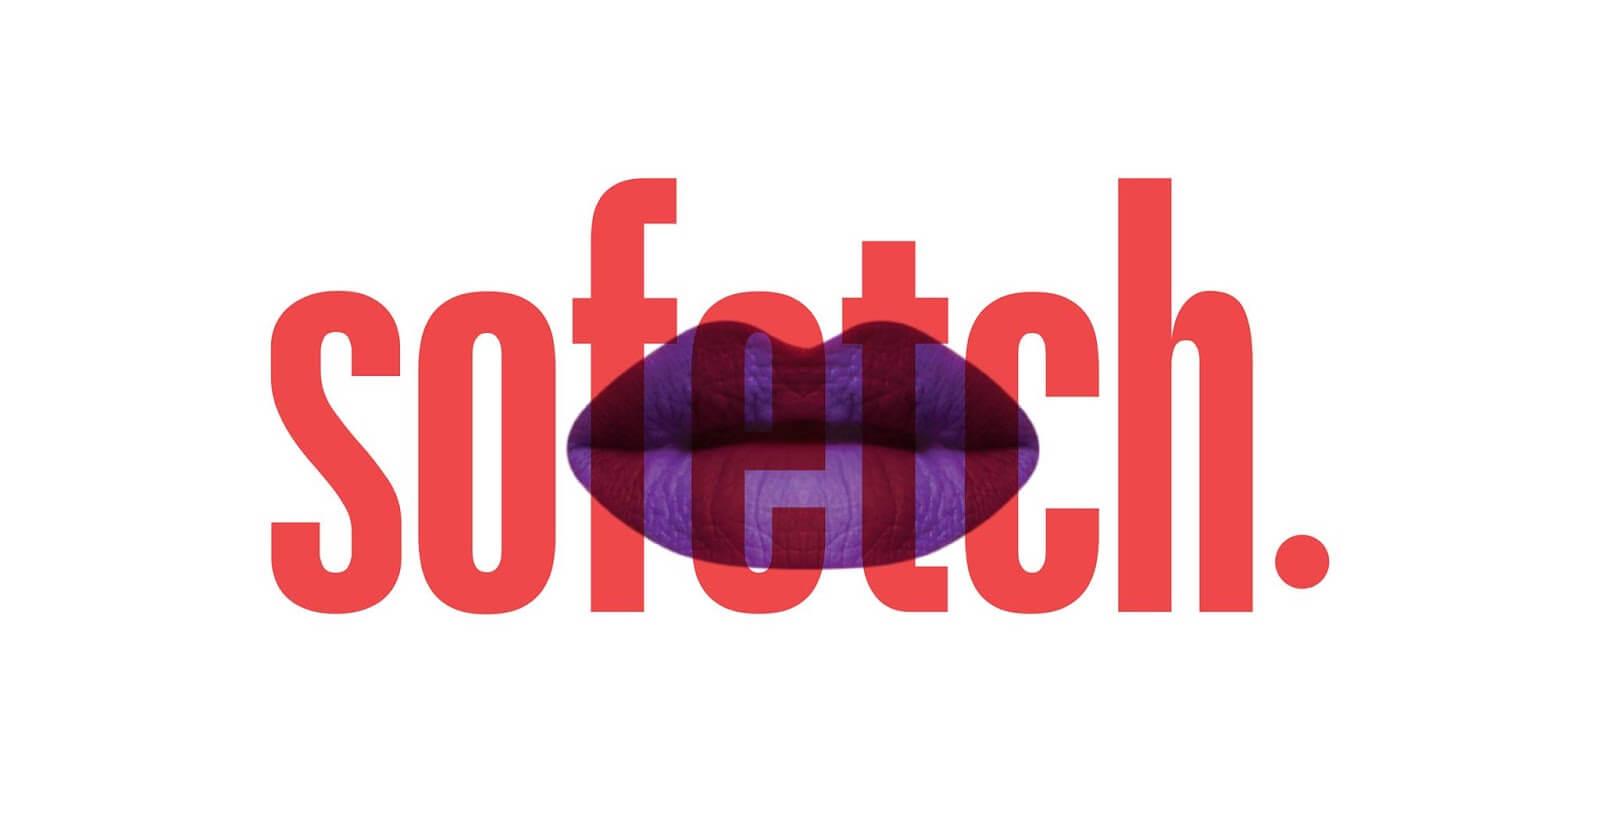 Sofetch